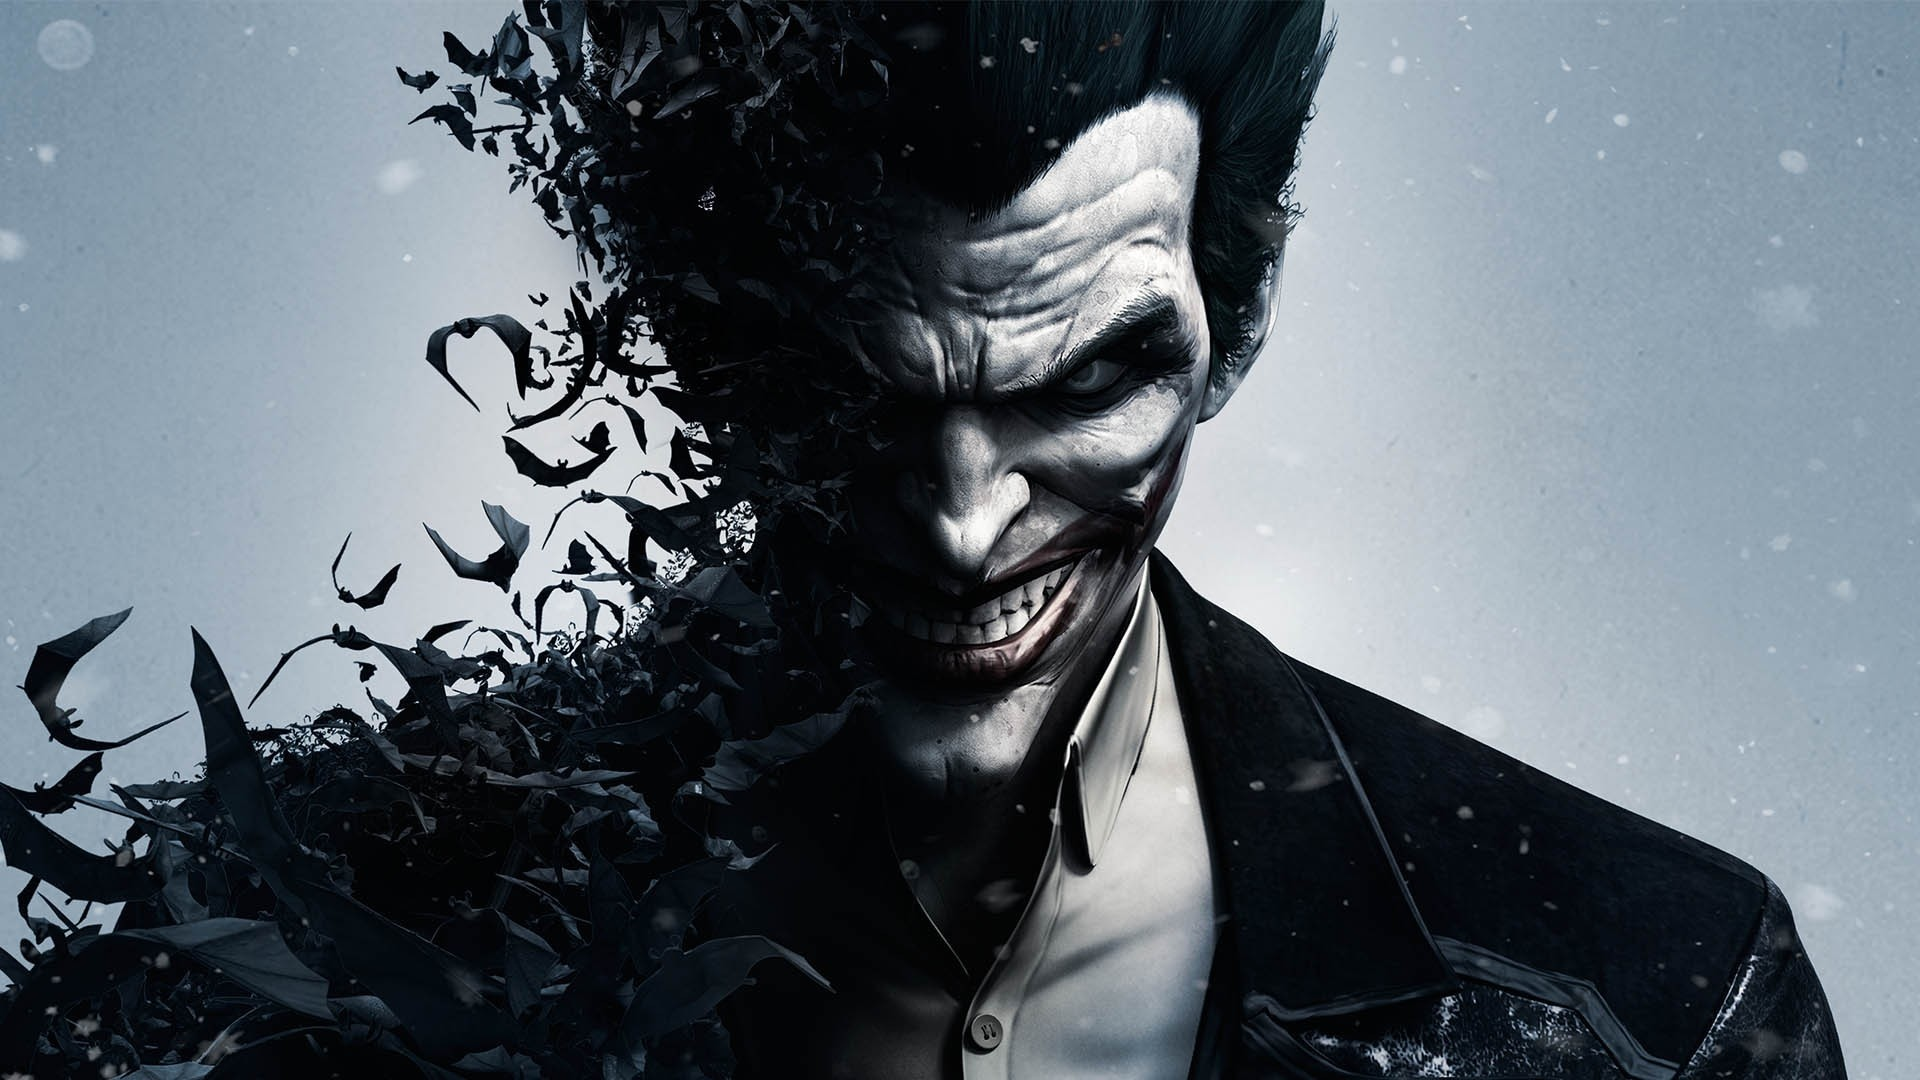 Res: 1920x1080, Full HD 1080p Joker Wallpapers HD, Desktop Backgrounds  ... src